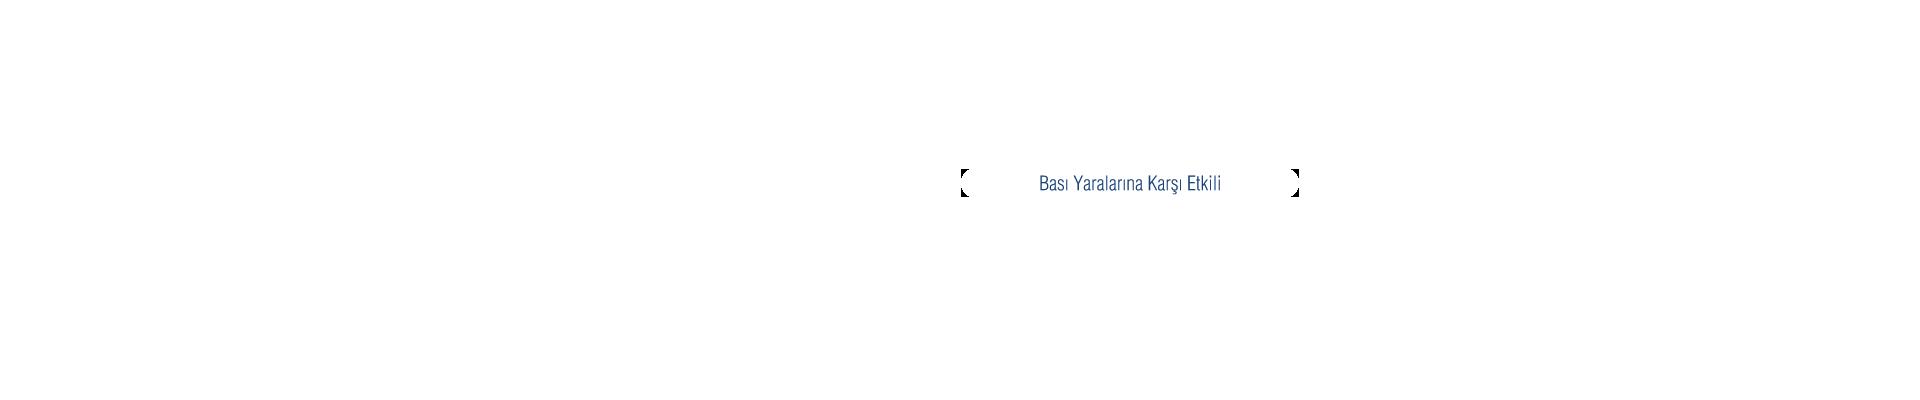 Banner Bedaid Tekerlekli Sandalye Minderi  Kutu1